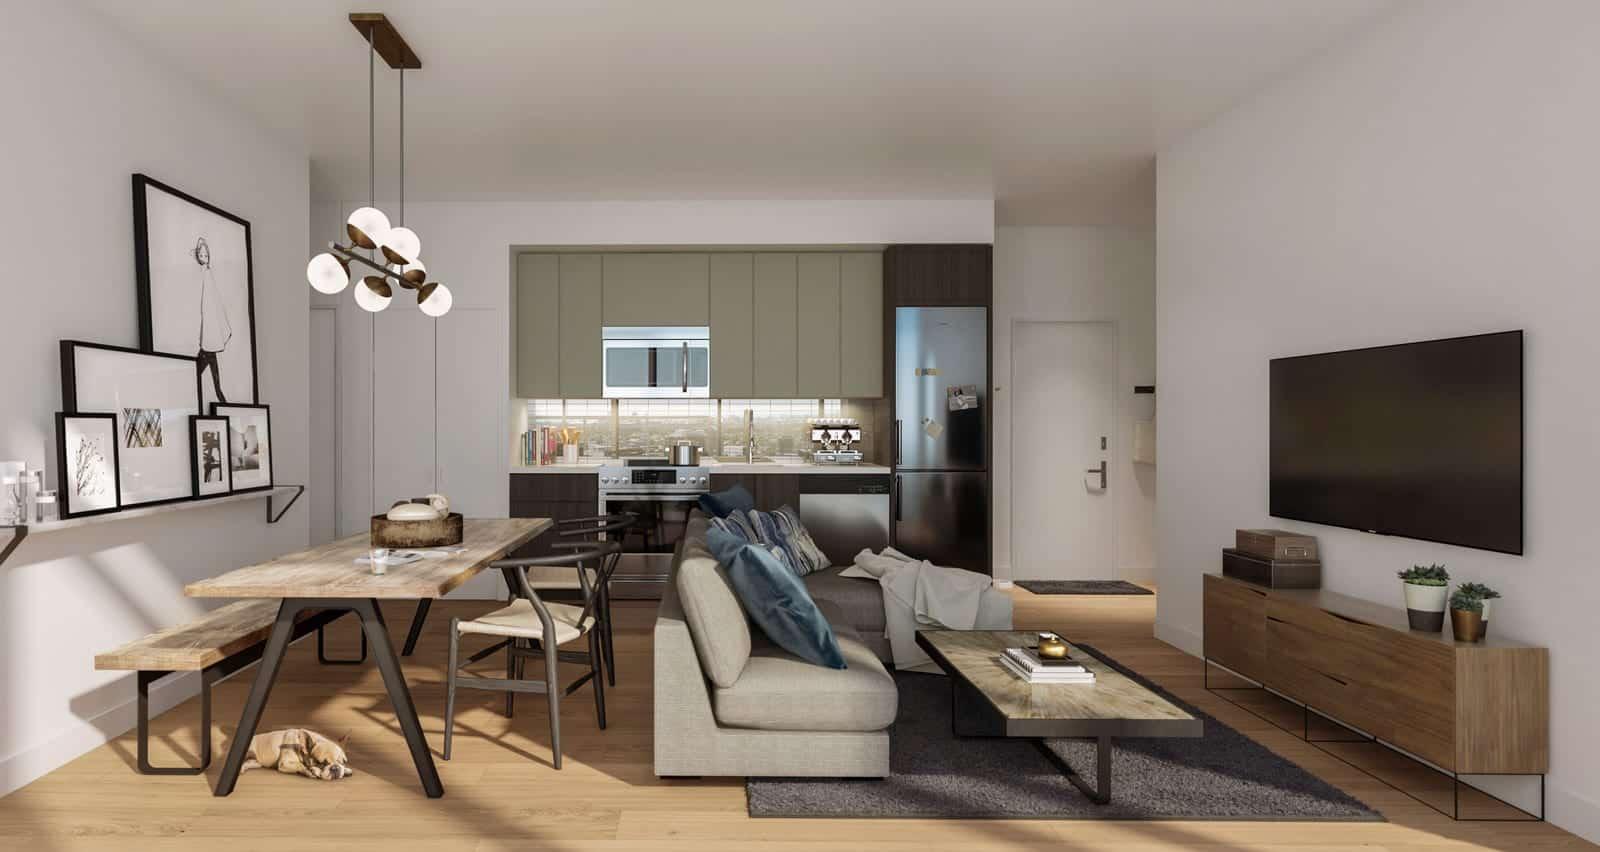 Home Condos at Power and Adelaide Interior True Condos